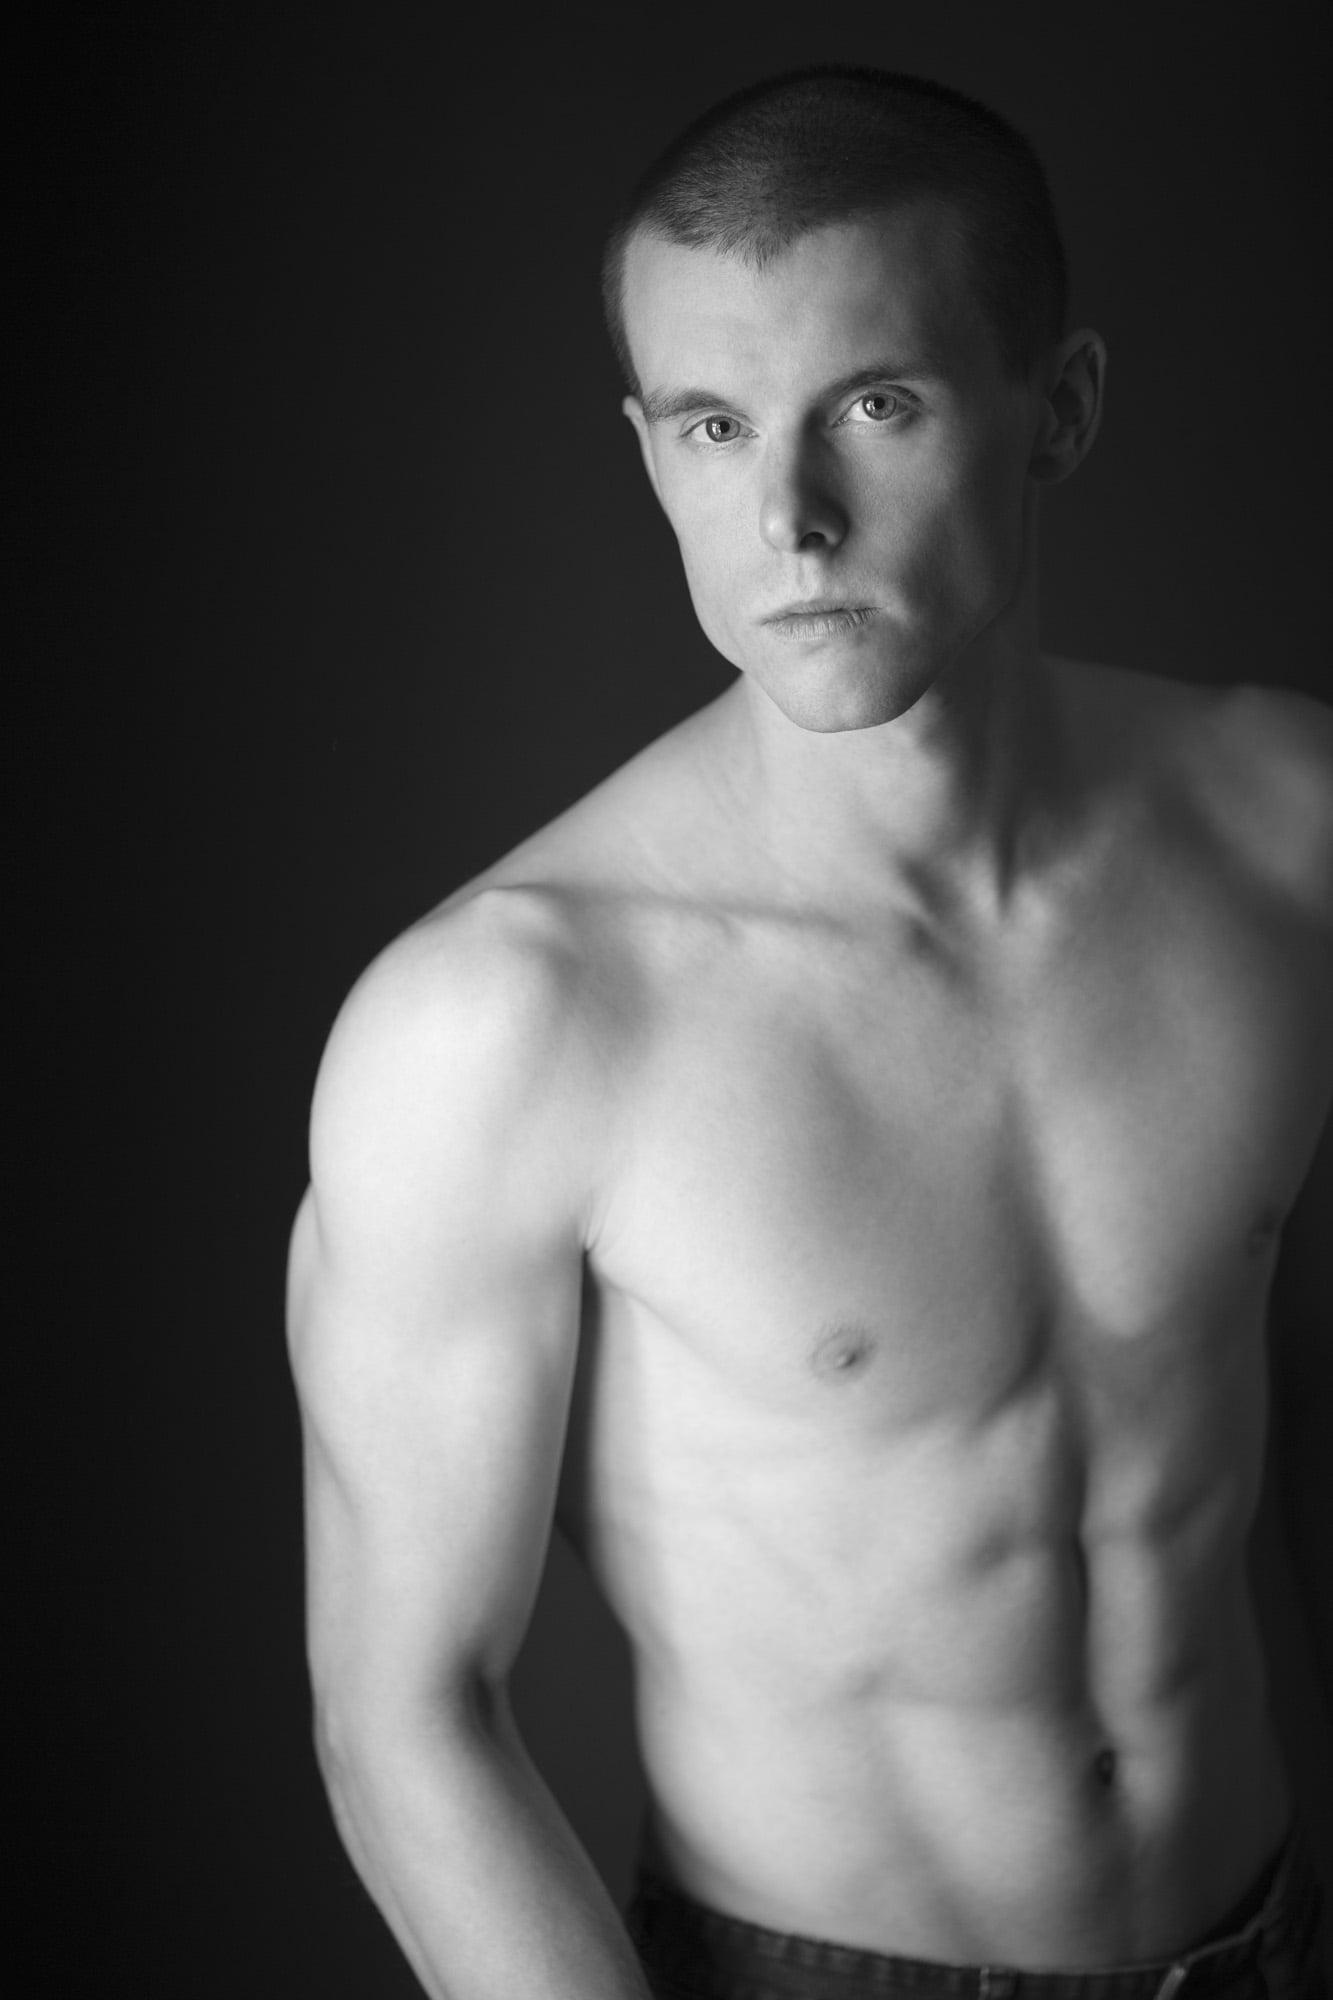 Lucas's studio style fitness photo shoot with portrait photographer Jason Guy